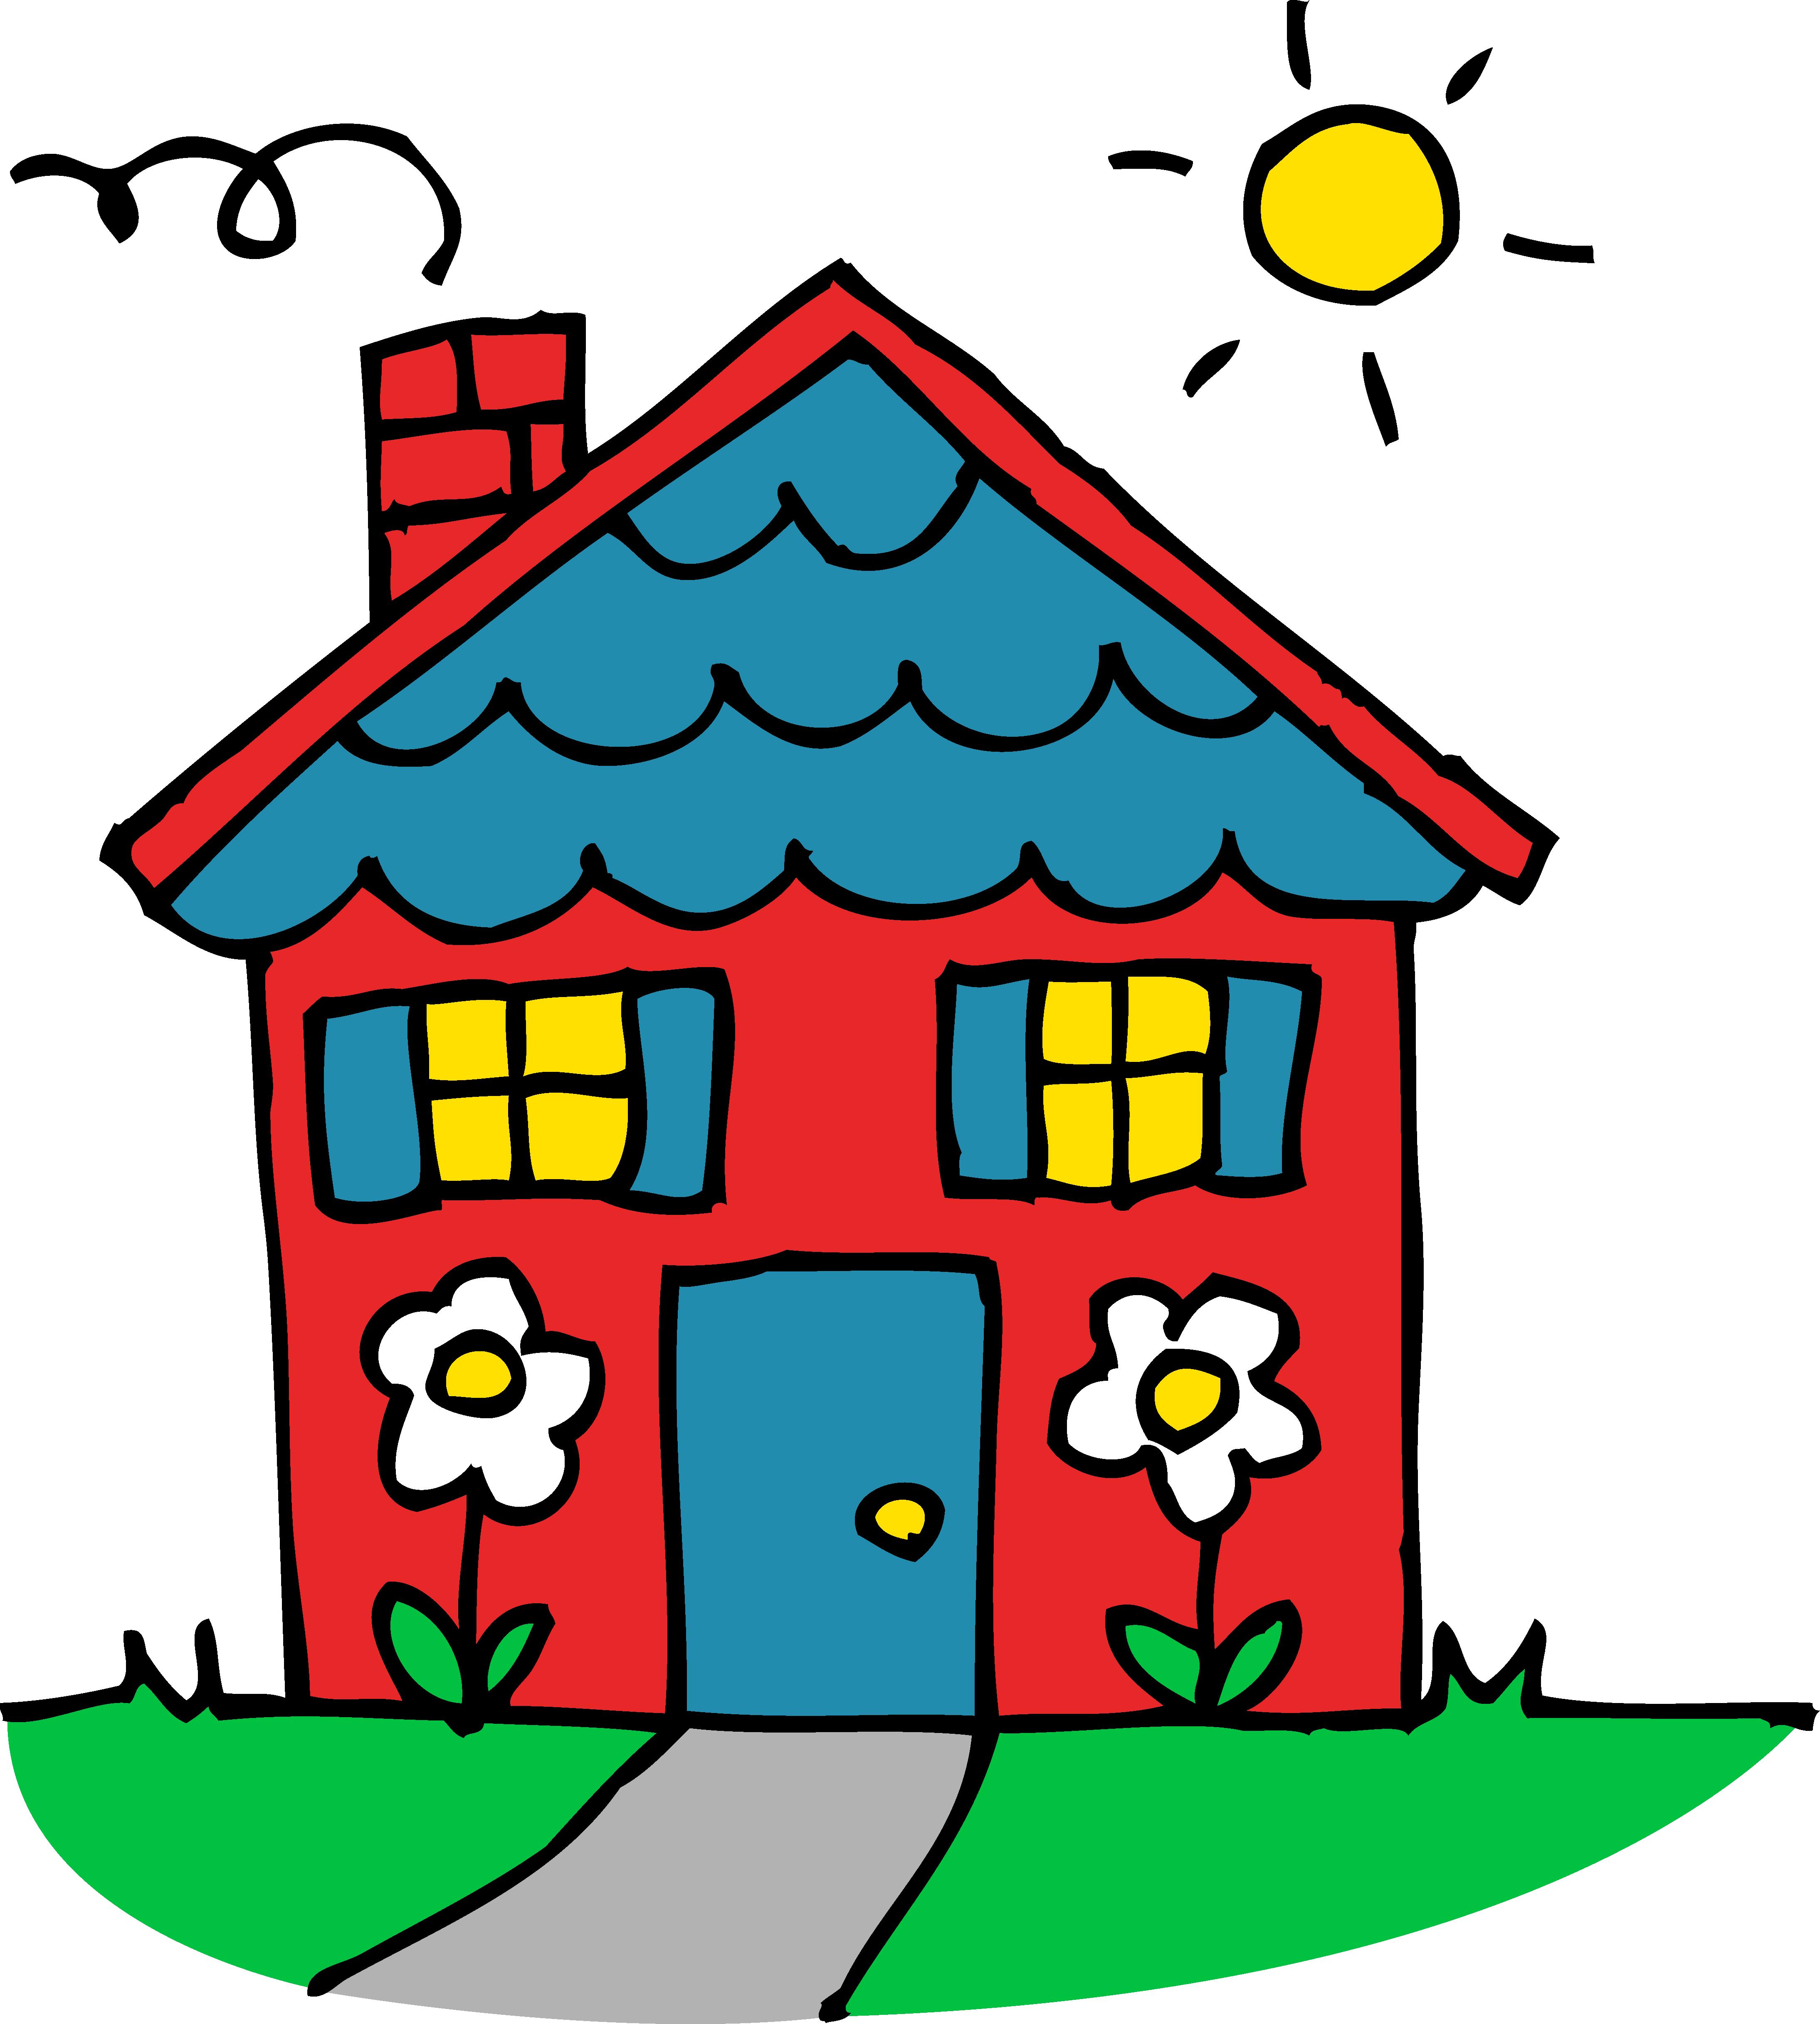 4377x4868 House Clip Art Free Cartoon Clipart Images